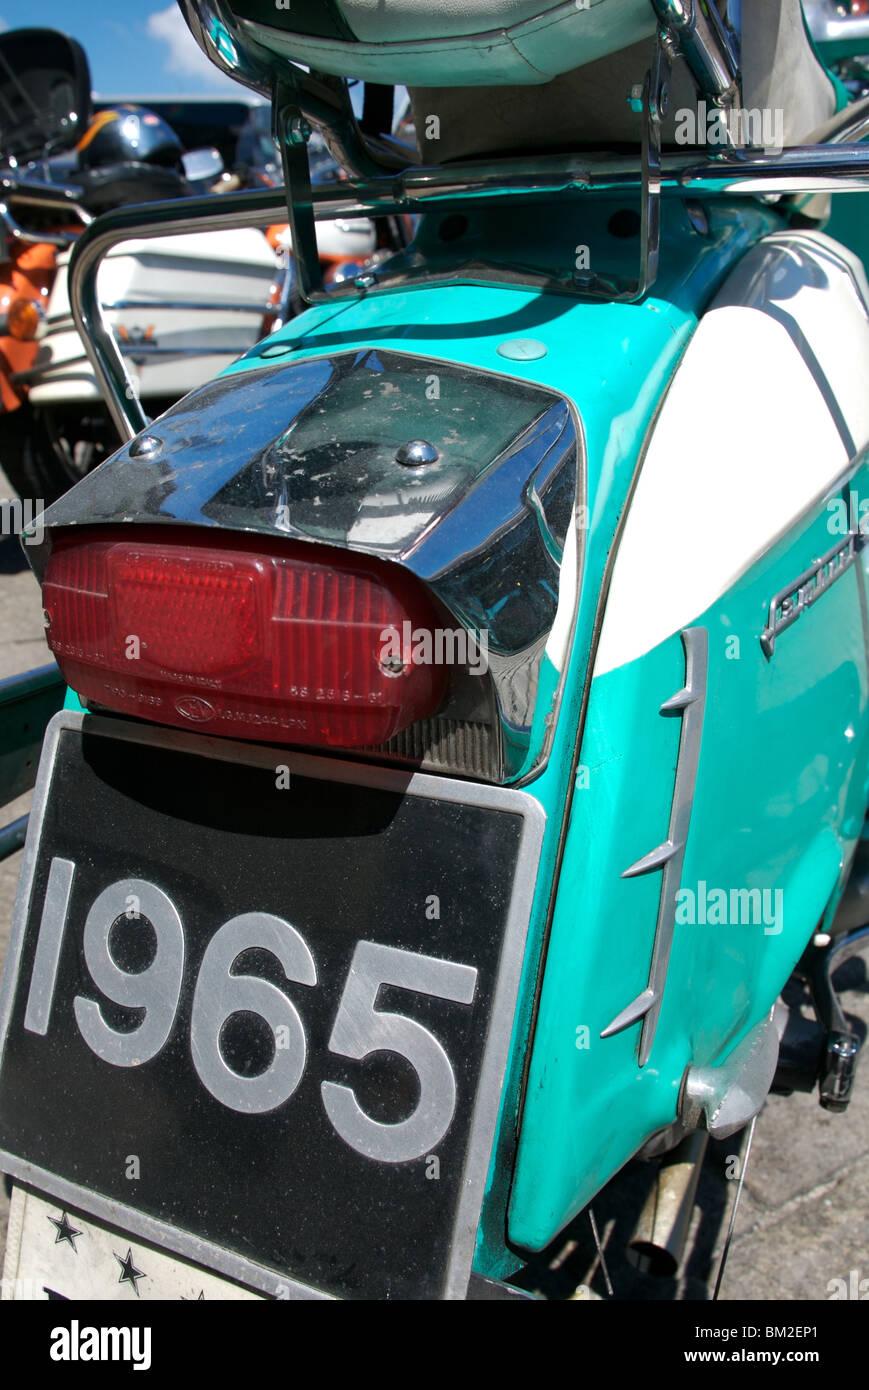 Two tone 1965 Lambretta moped, Plymouth, Devon, UK - Stock Image